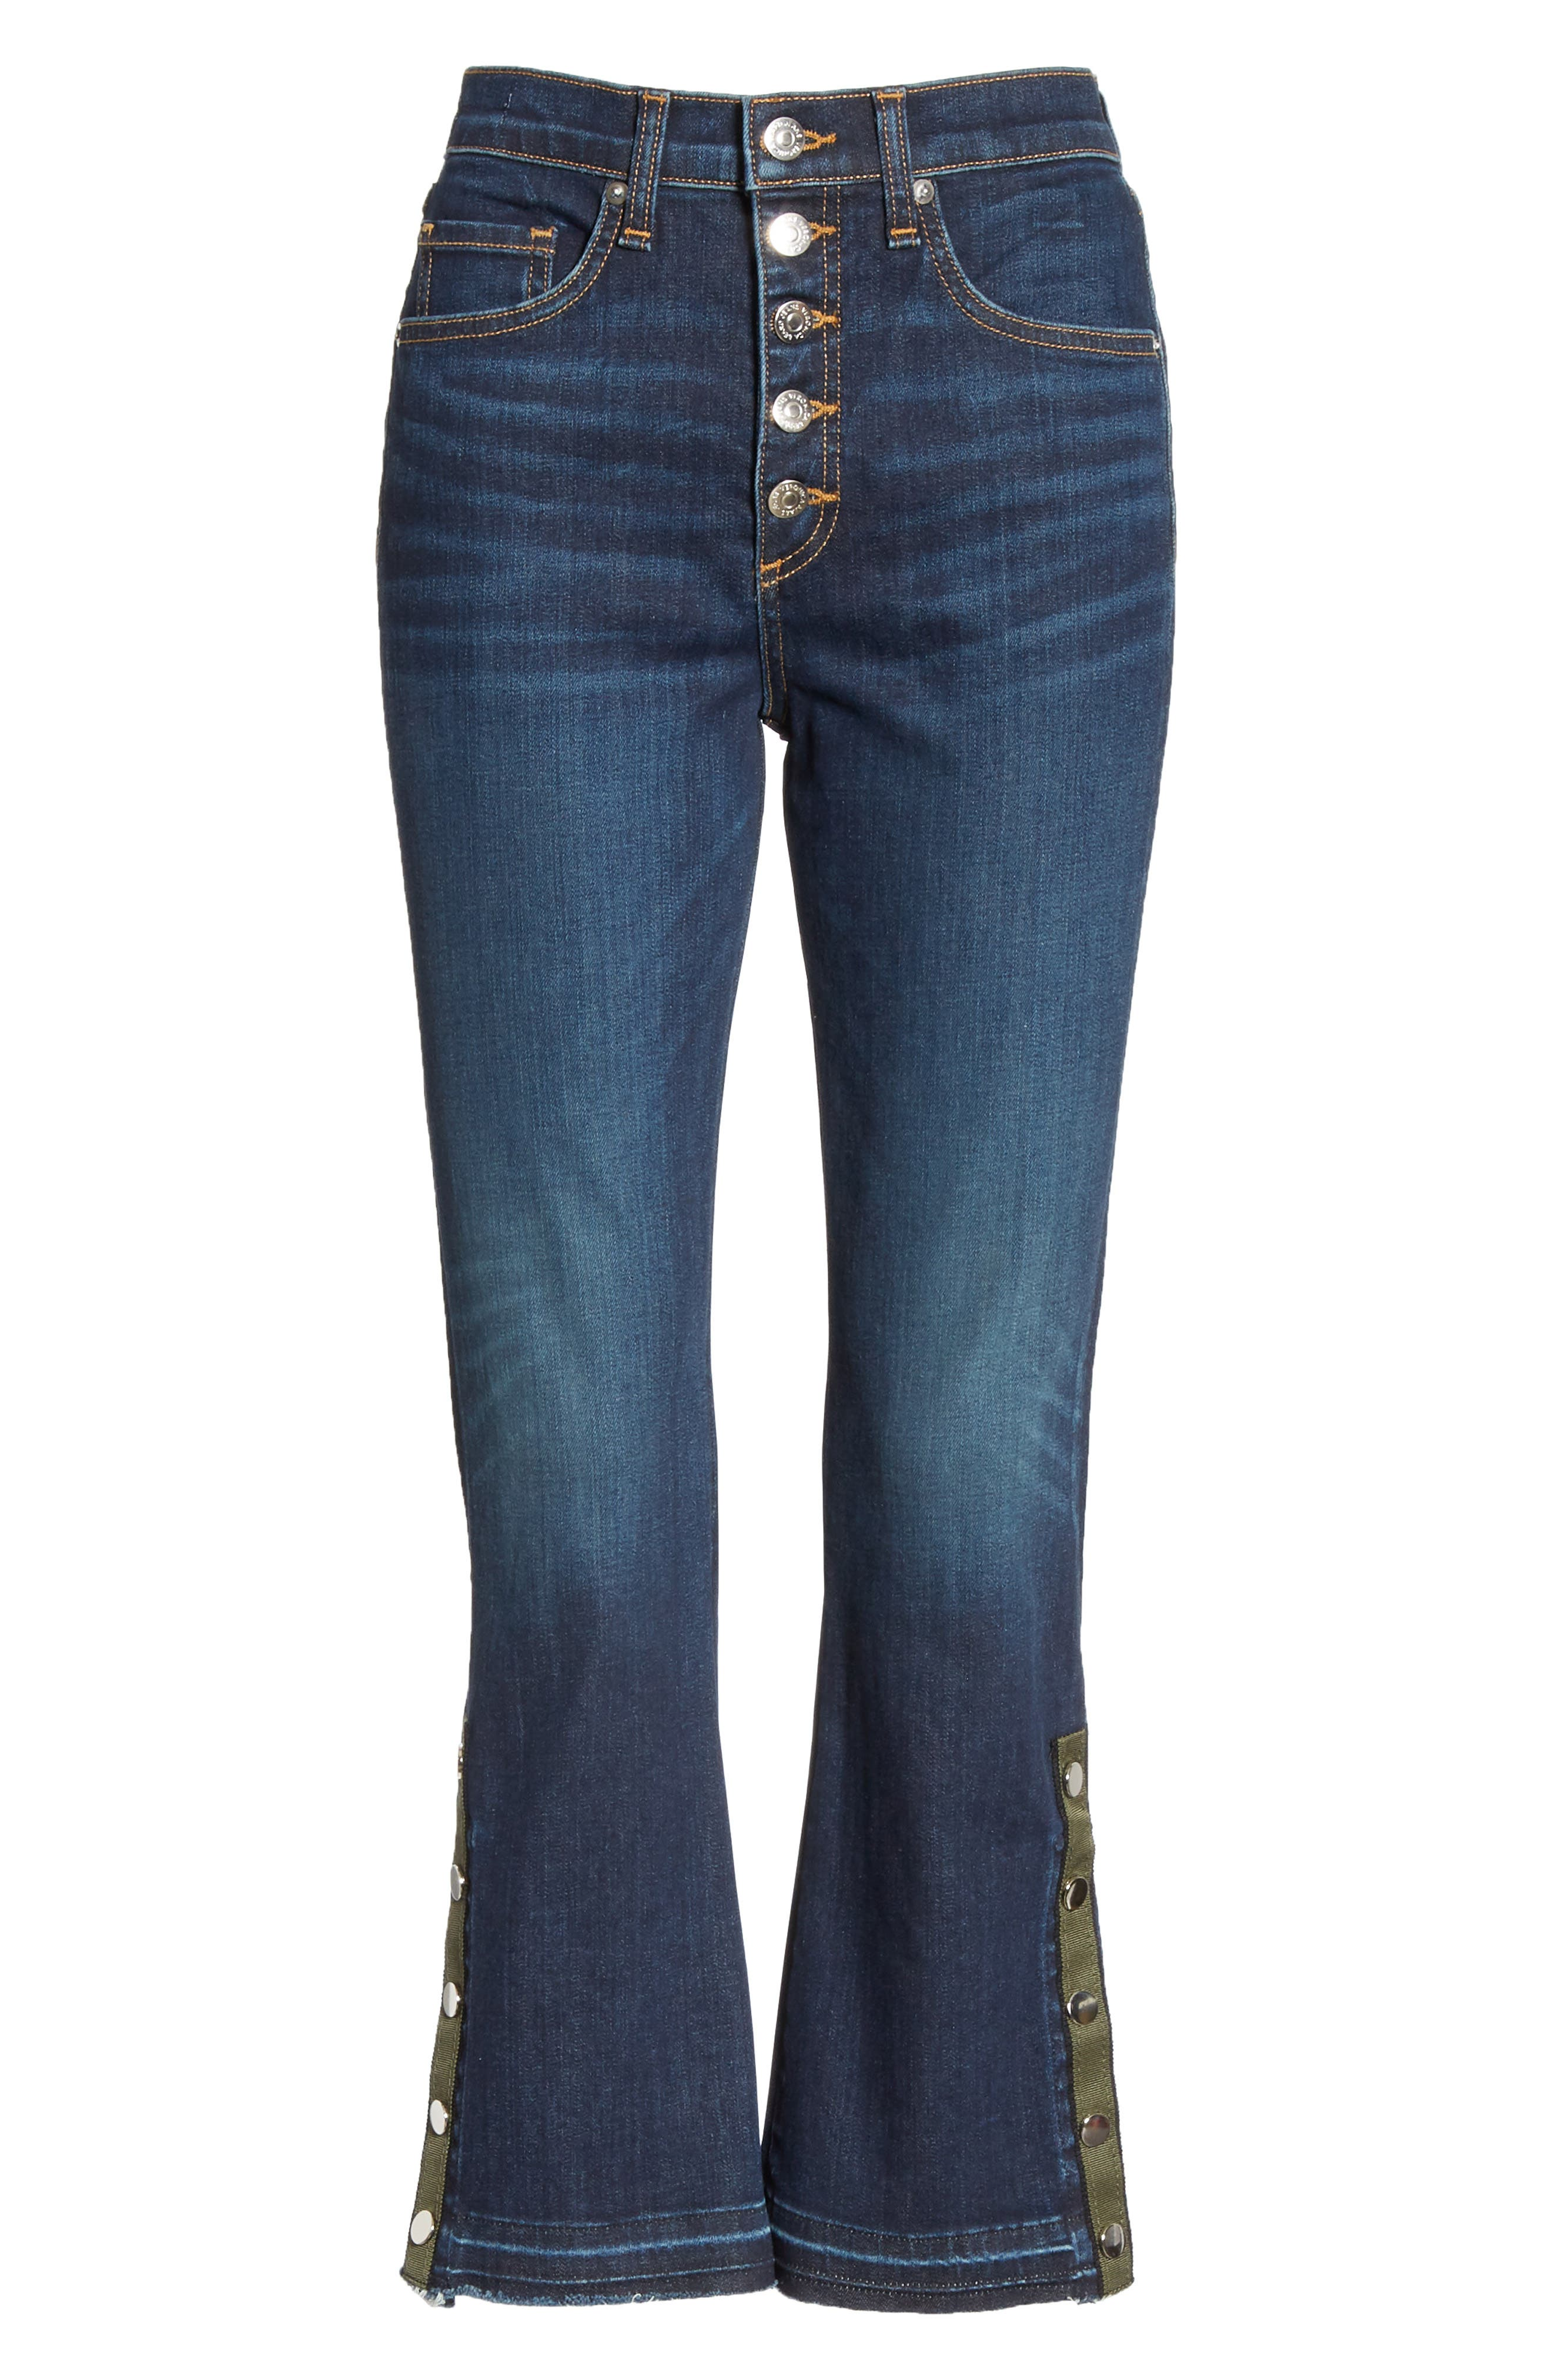 VERONICA BEARD, Carolyn Side Vent Baby Boot Jeans, Alternate thumbnail 7, color, DARK VINTAGE